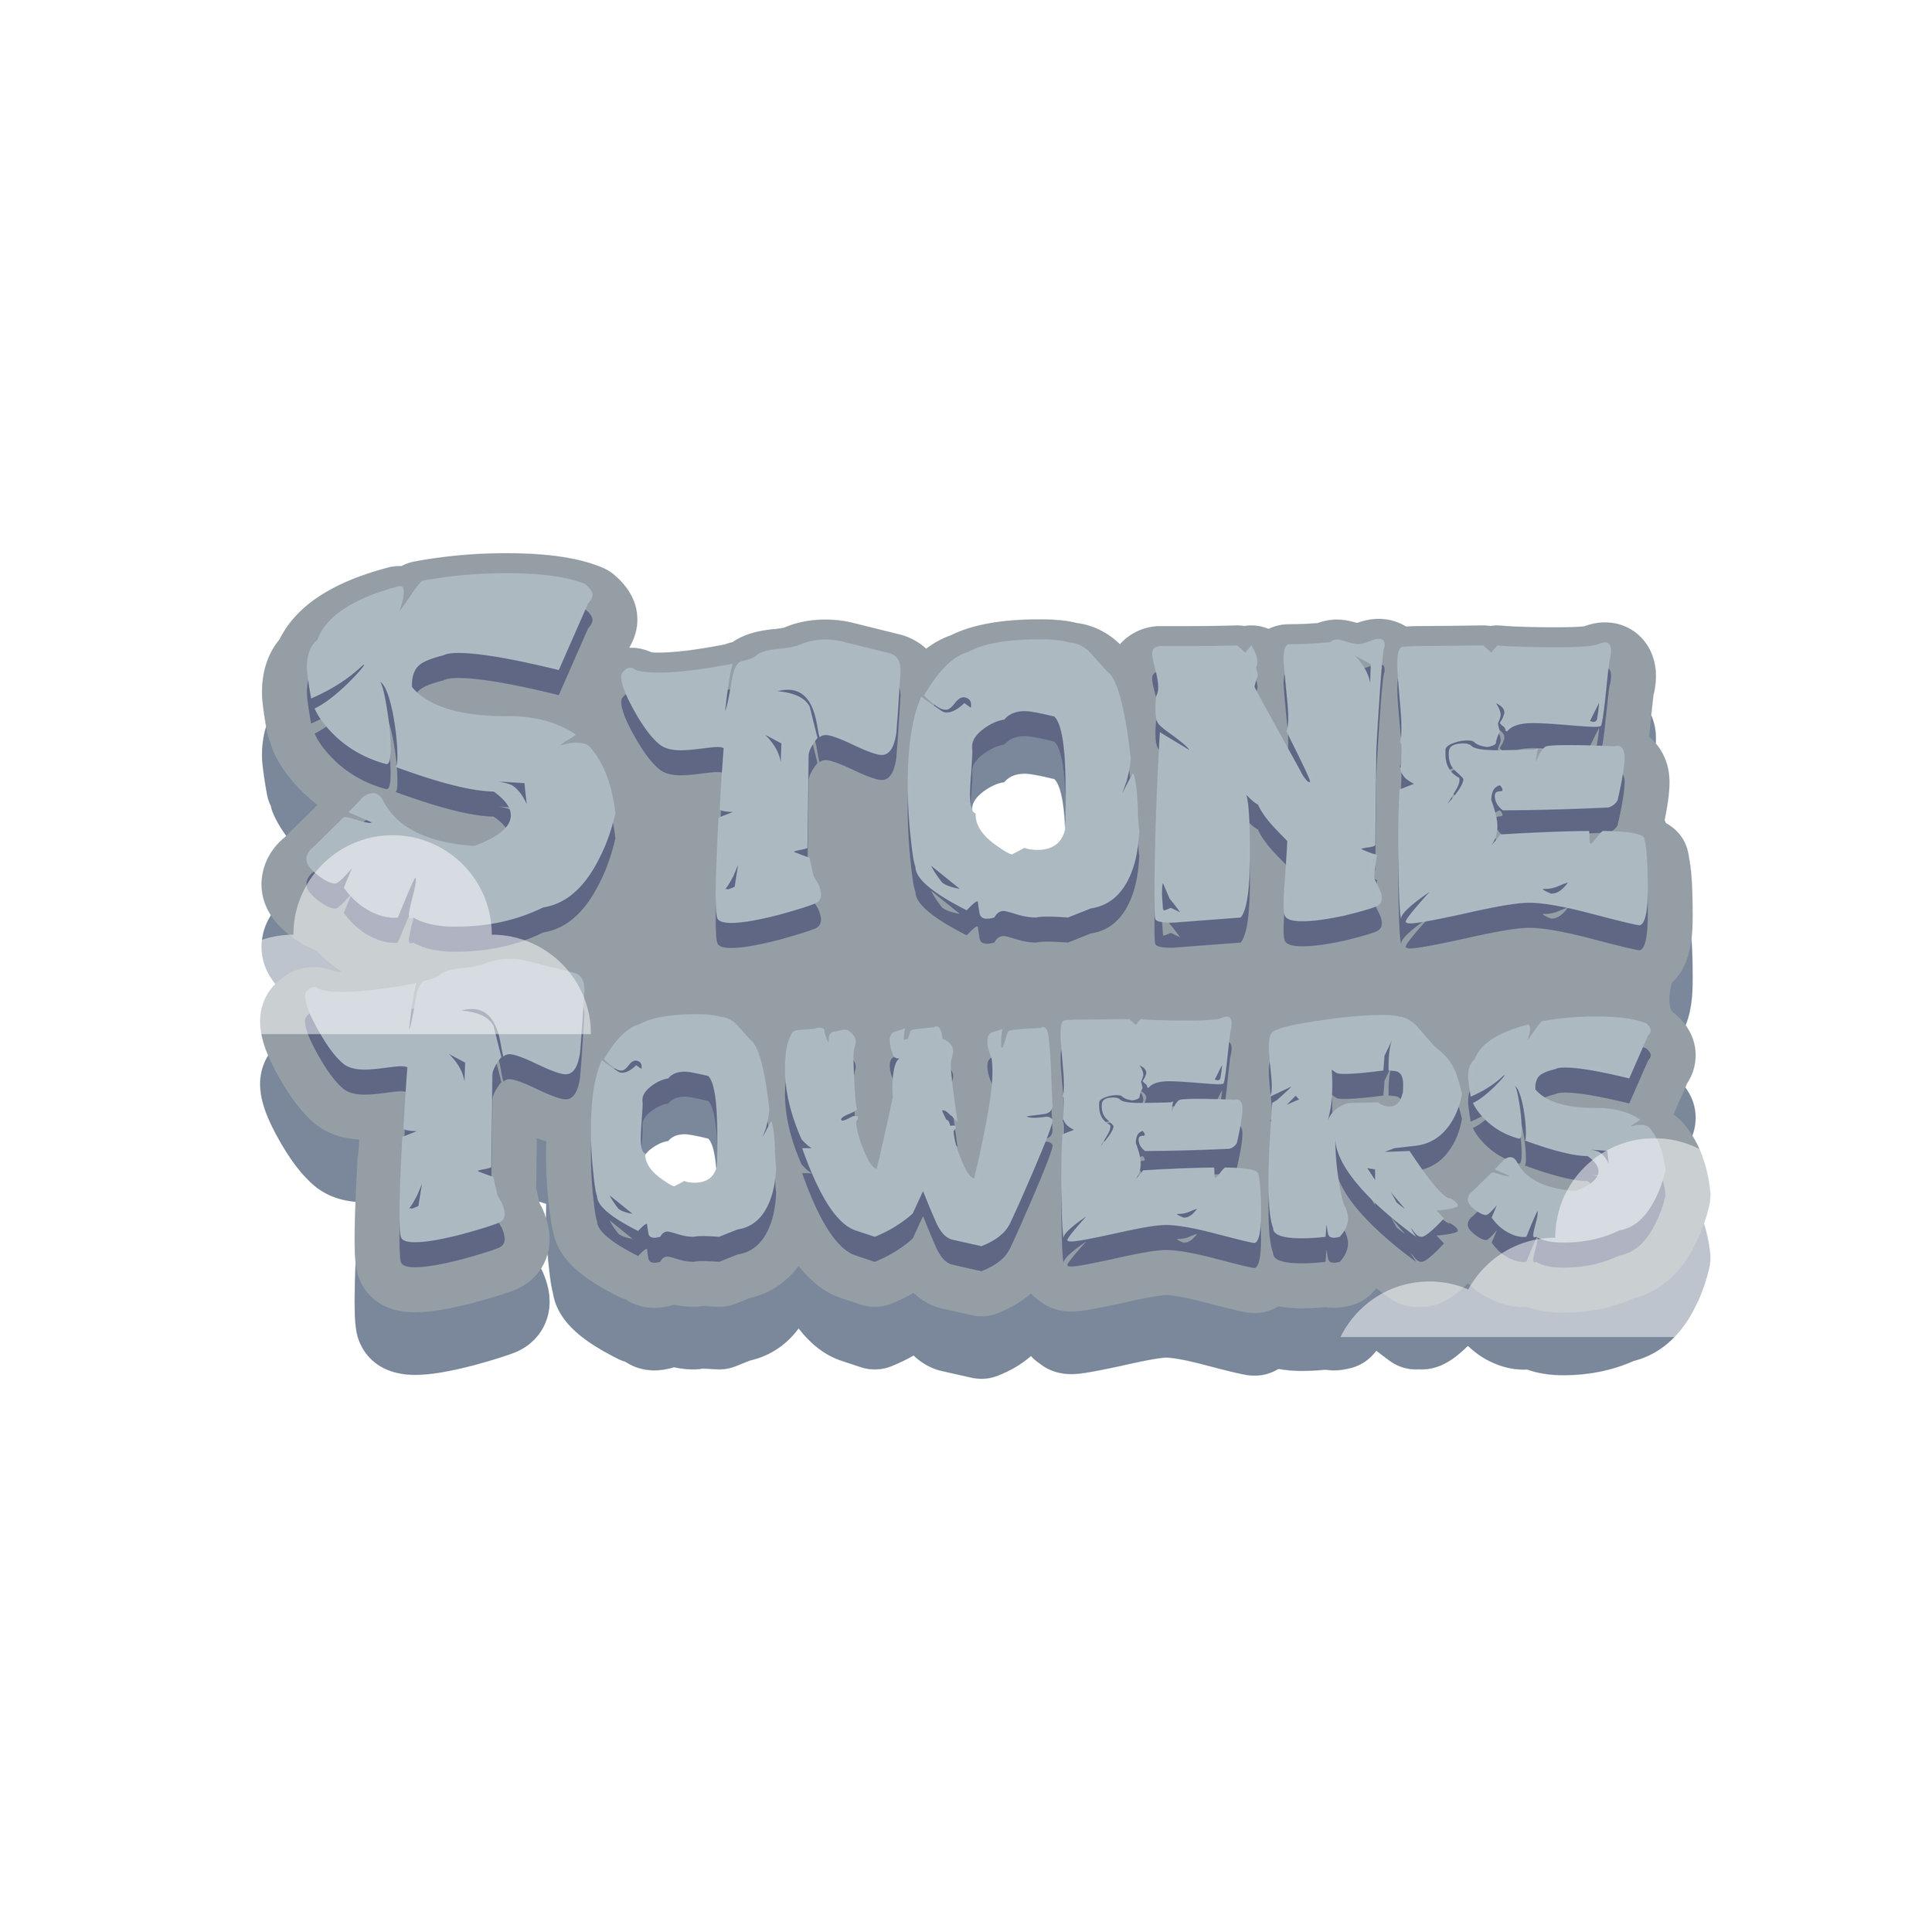 Stone_Towers.jpg